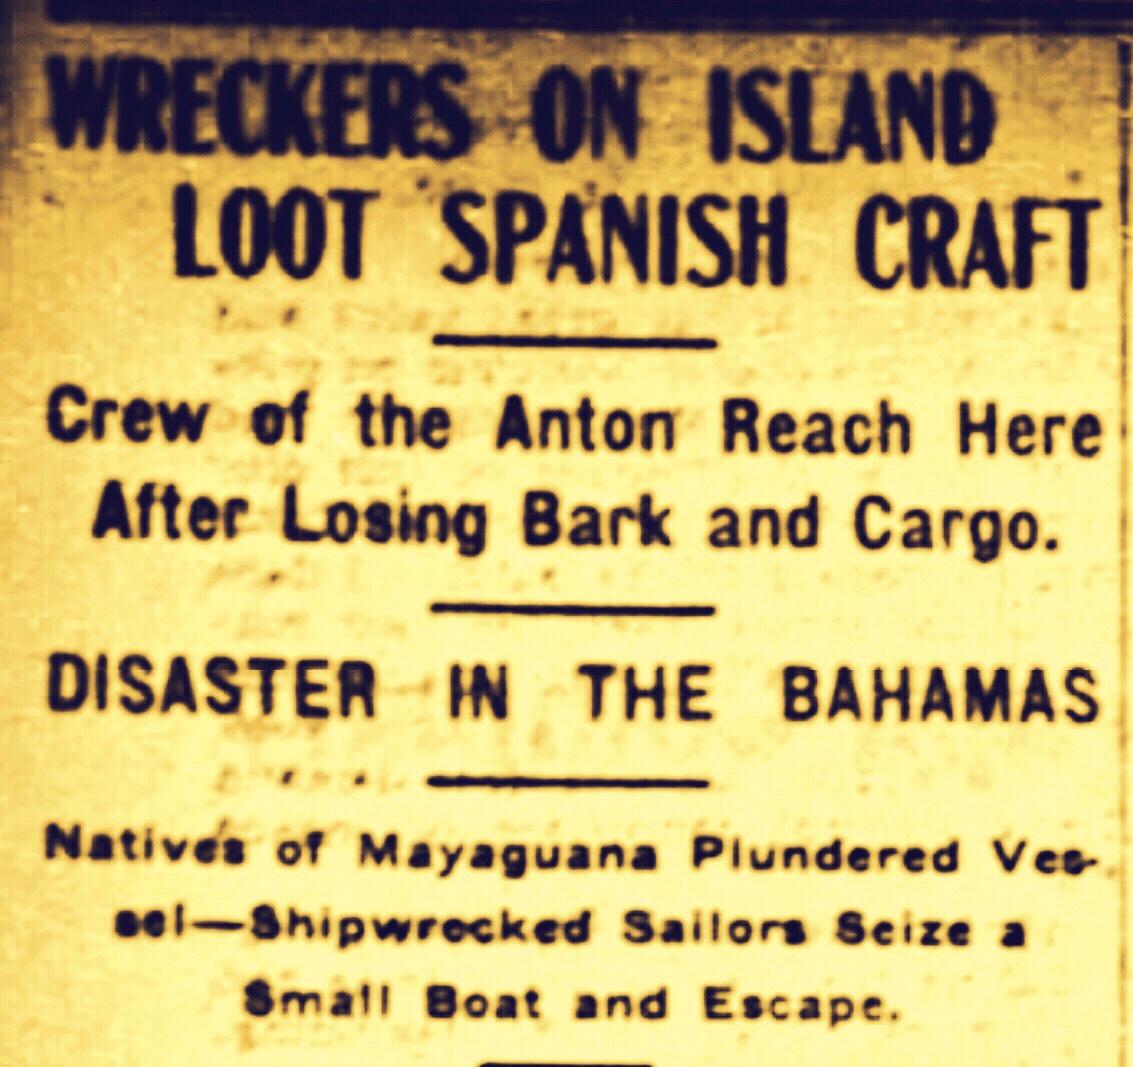 Spaniards Held Prisoners on Mayaguana 1905